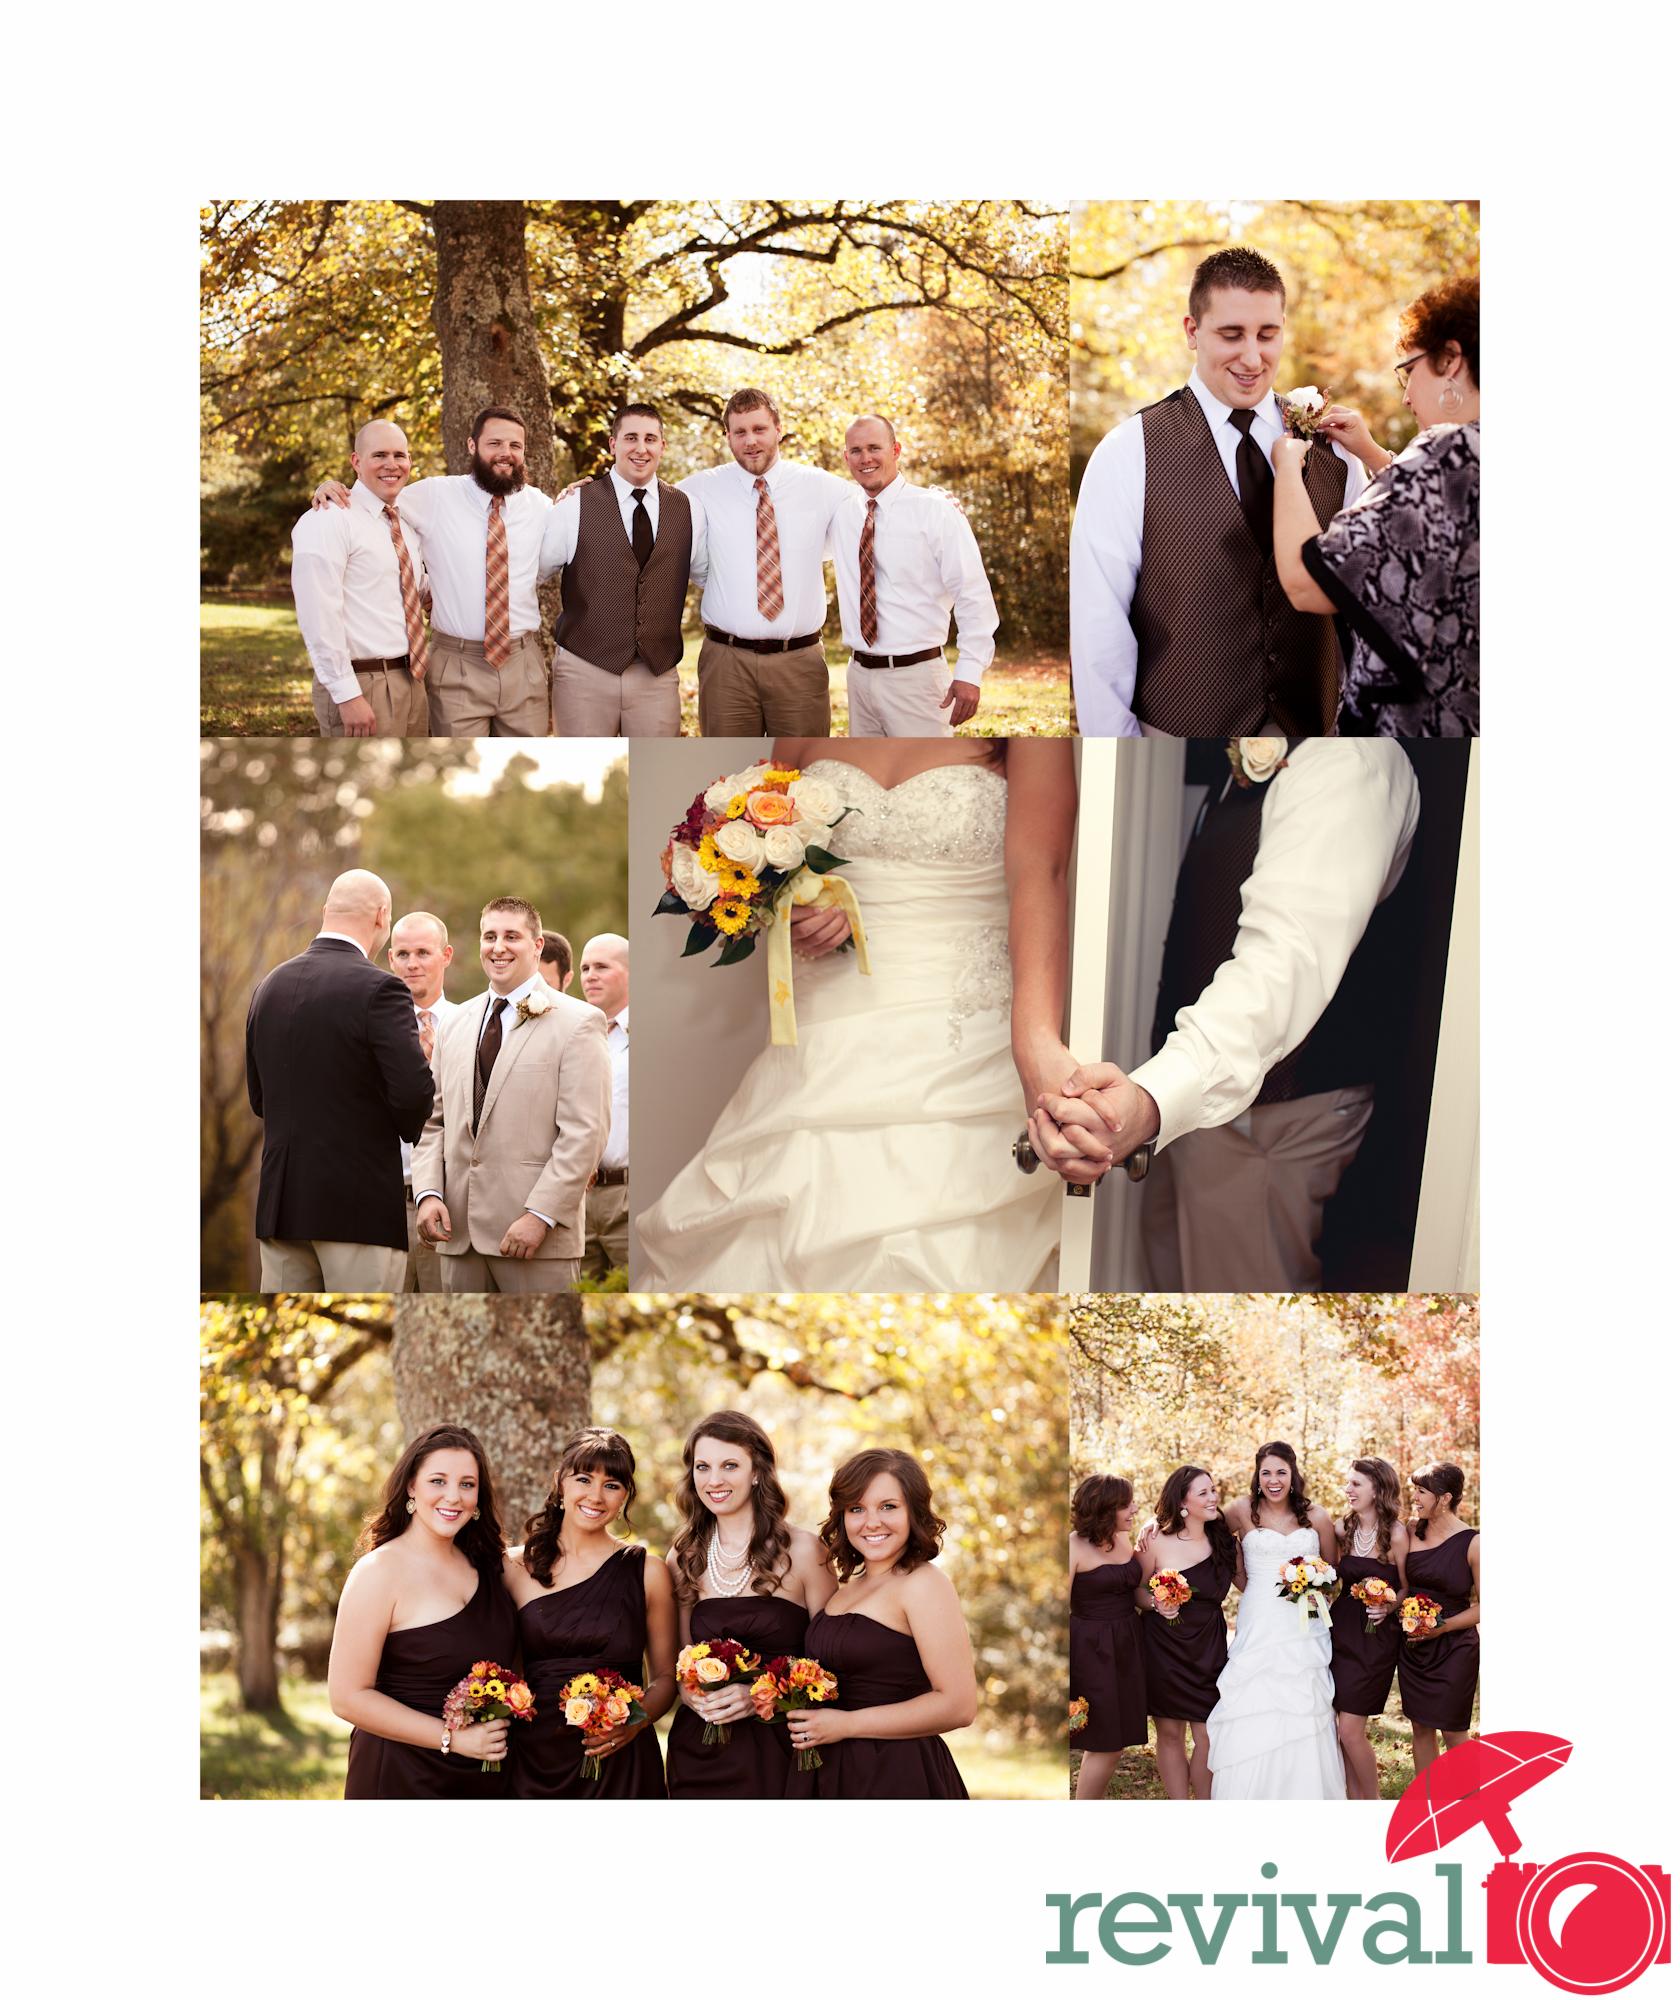 Wedding Photos by Revival Photography Jason and Heather Barr North Carolina Photographers